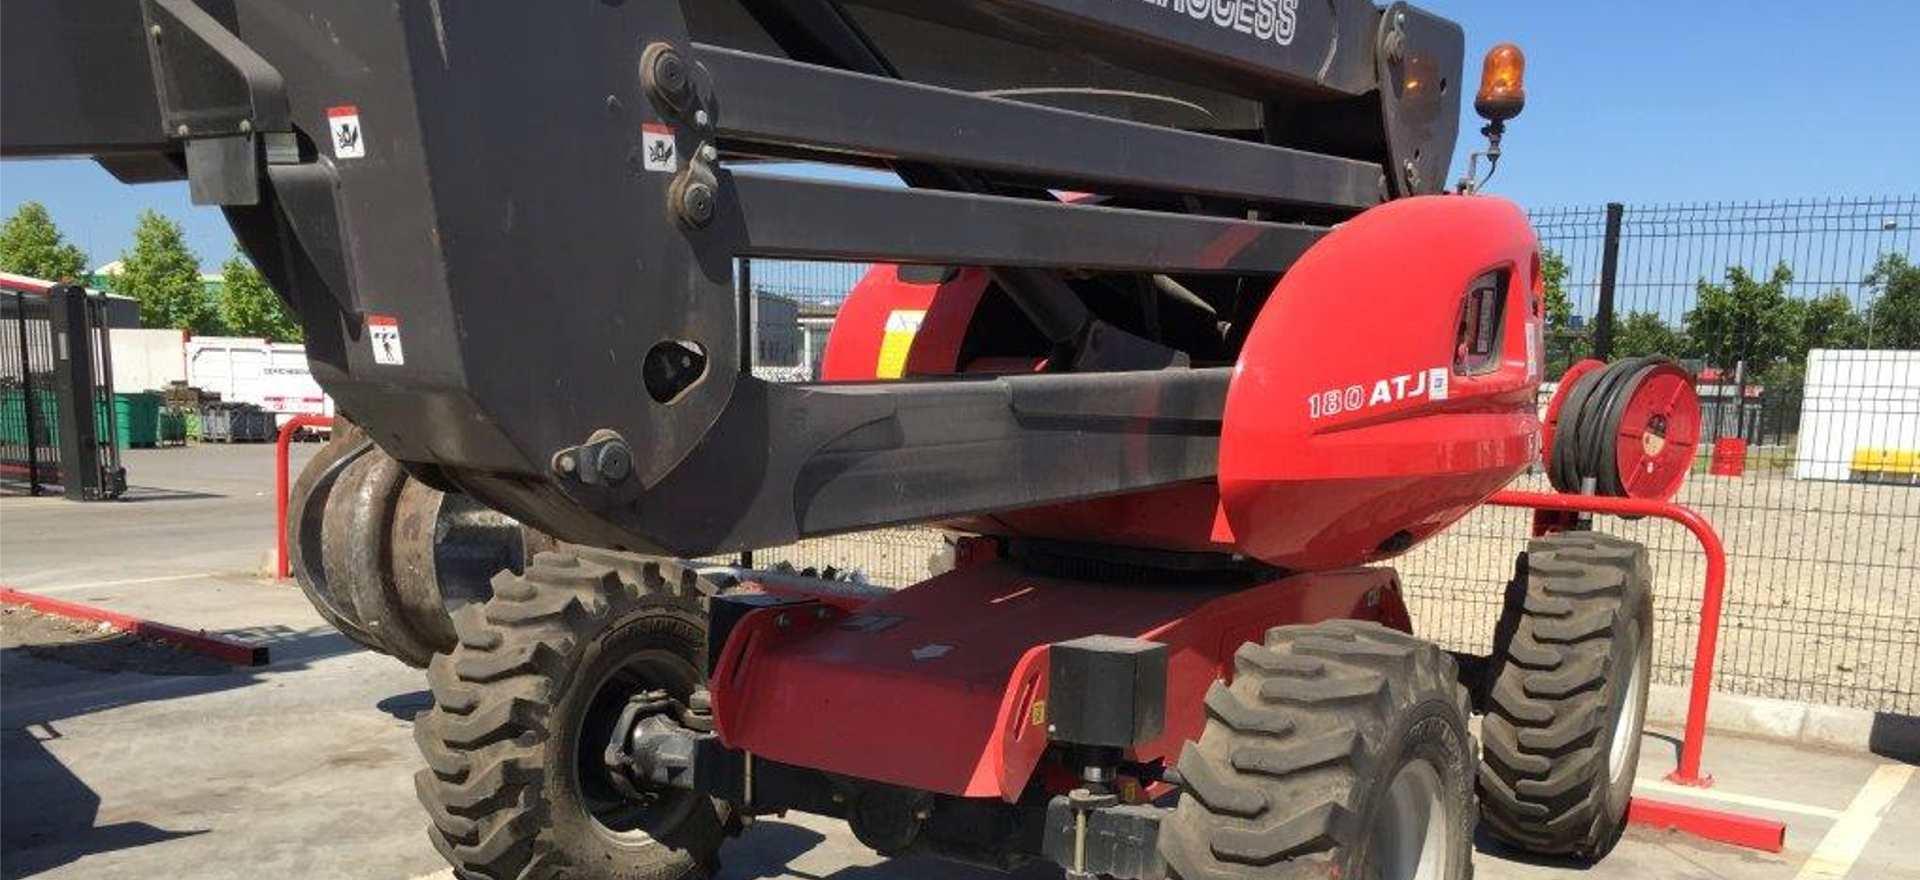 Bertrand pneus distribue pneus engins industriels